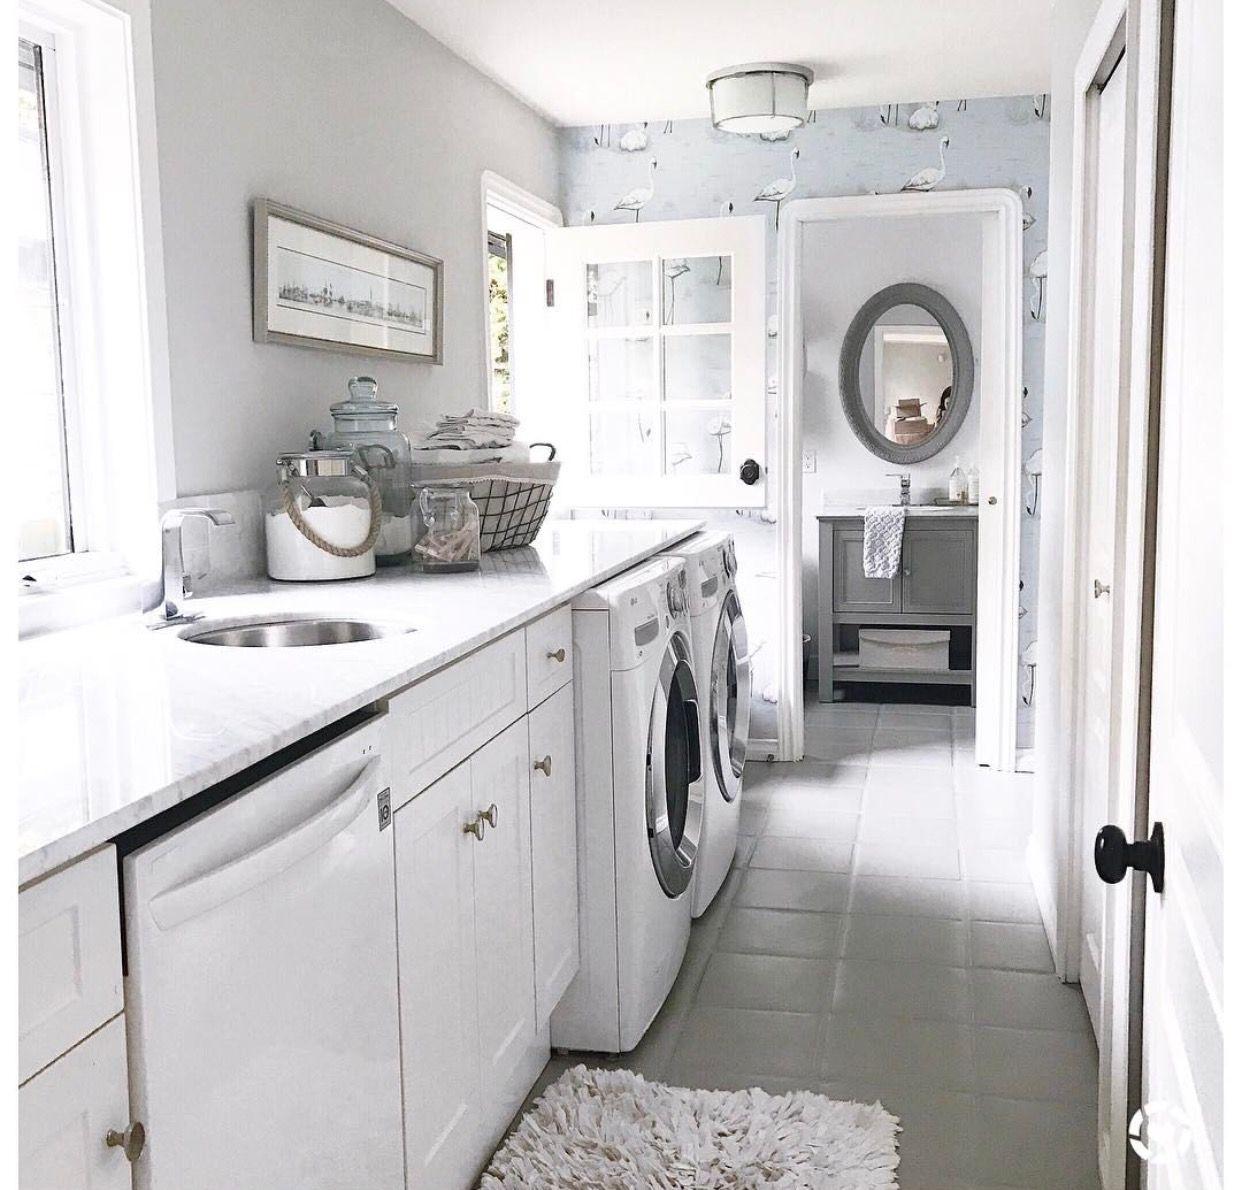 Explore Laundry Room Design Rooms And More Jillian Harris